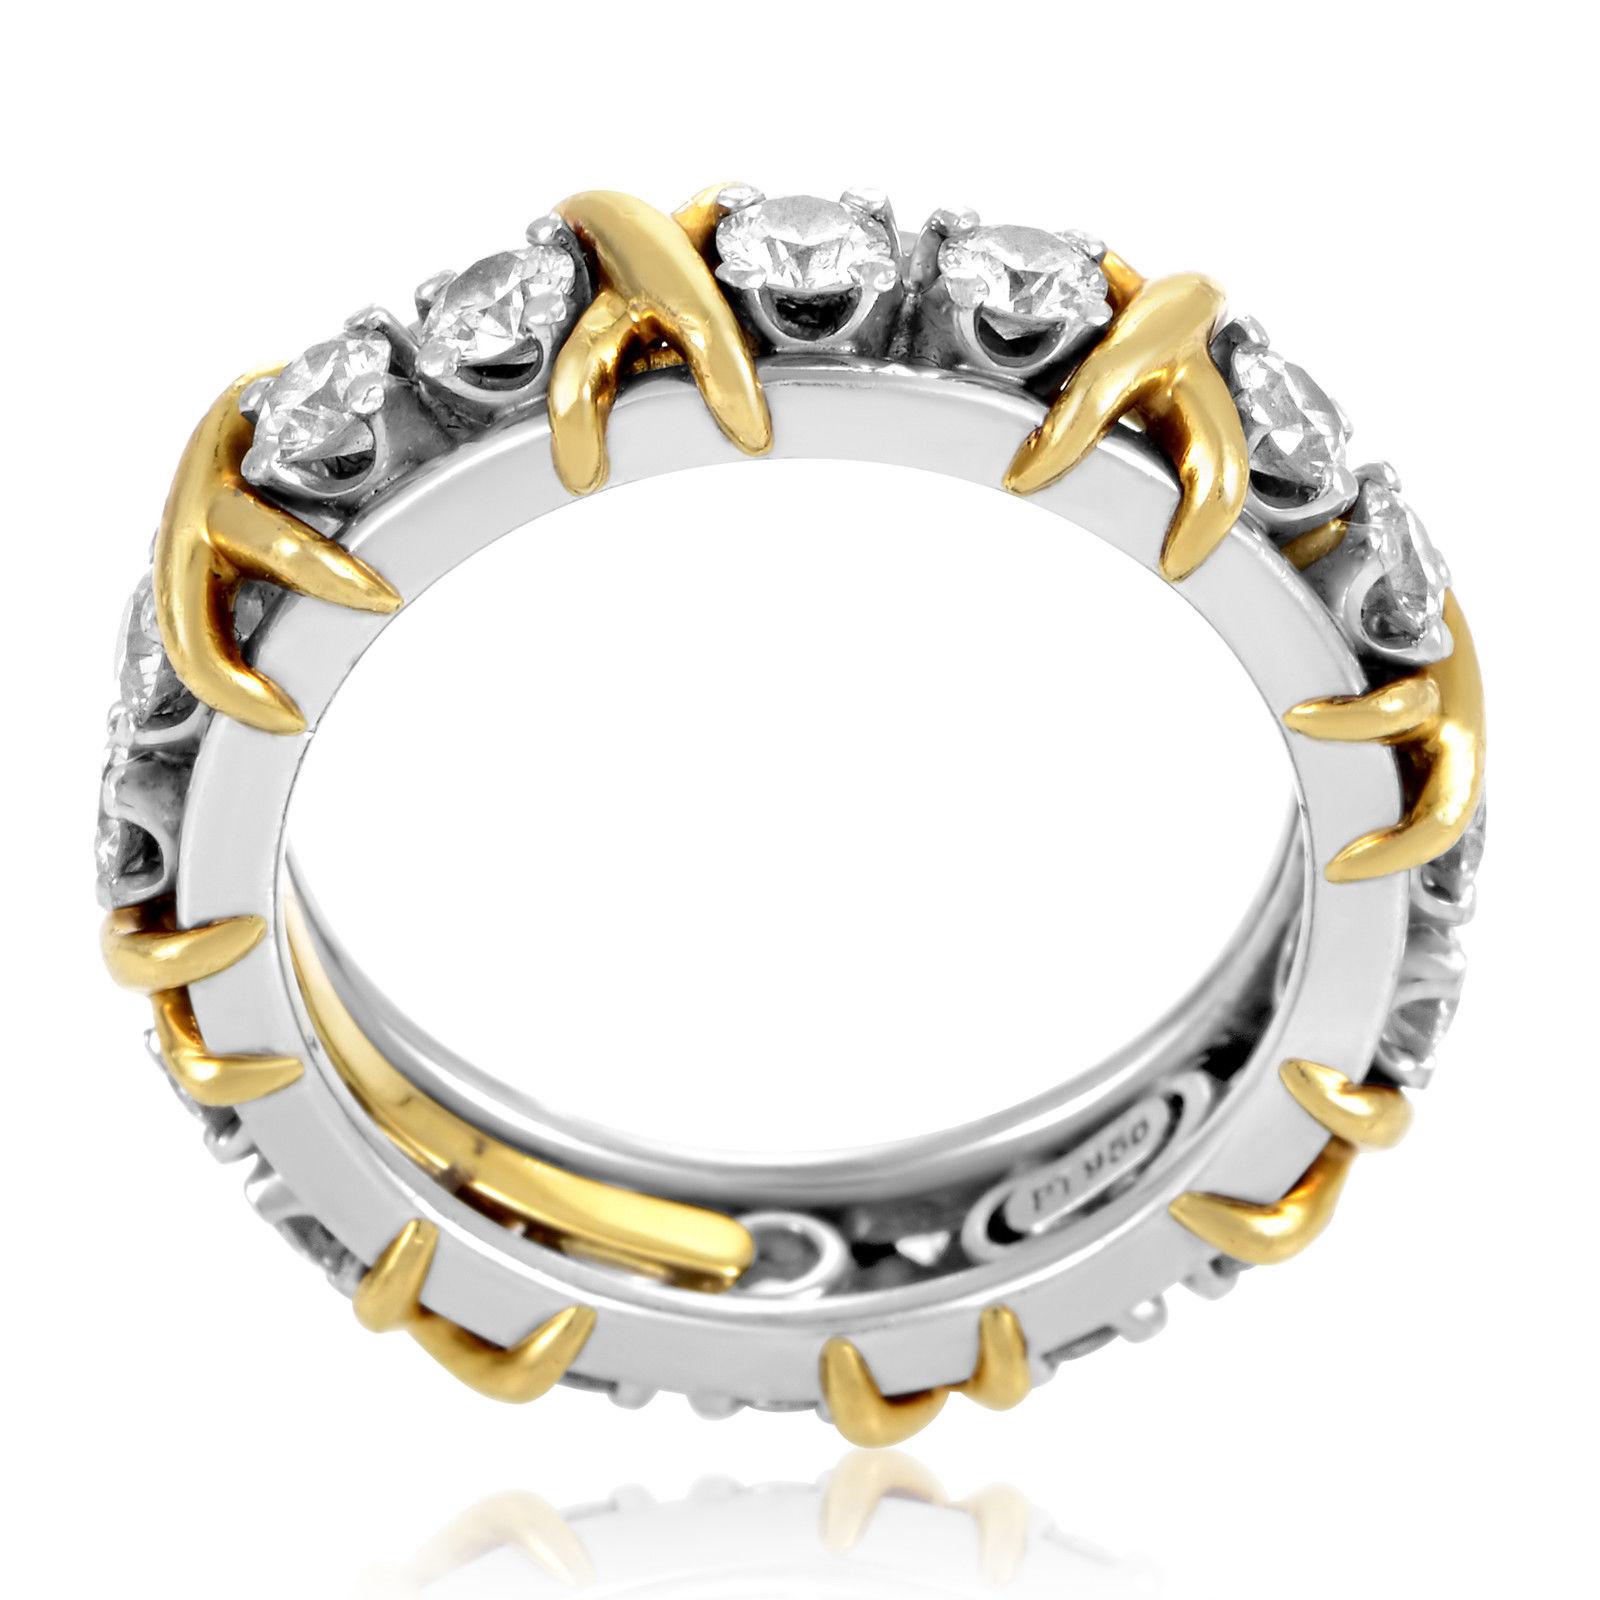 Tiffany & Co. Schlumberger Platinum & 18K Yellow Gold Diamond Eternity Band Ring